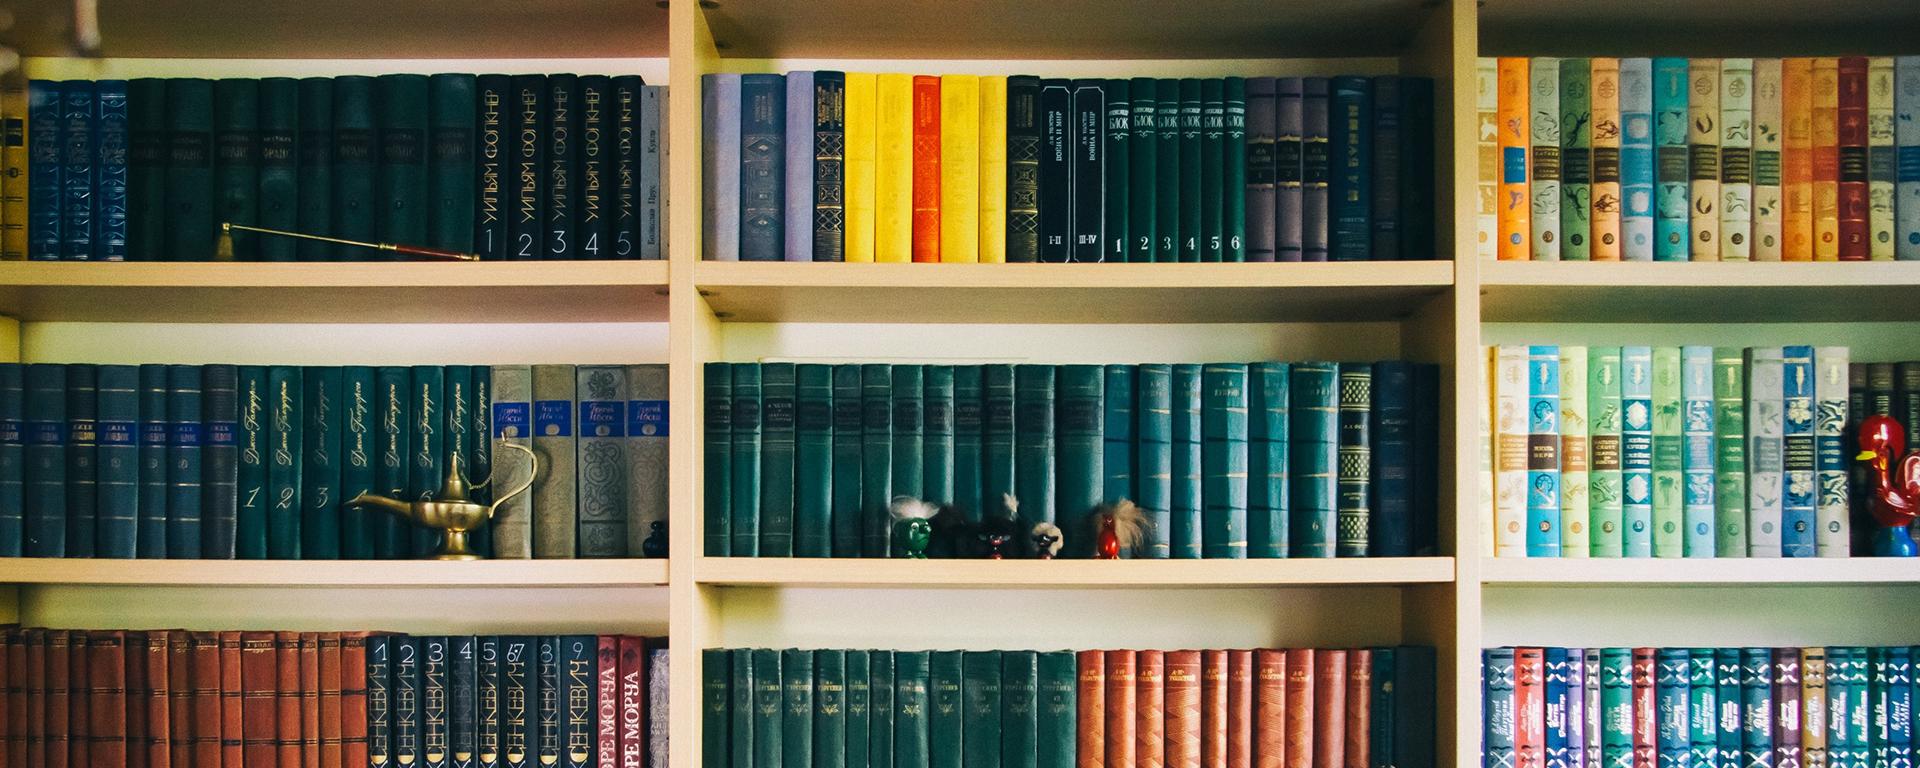 28b13905f9595 Estanteria Estante Biblioteca Muebles Antecedentes Libro Edificio Libros  Imagen de fondo para descarga gratuita